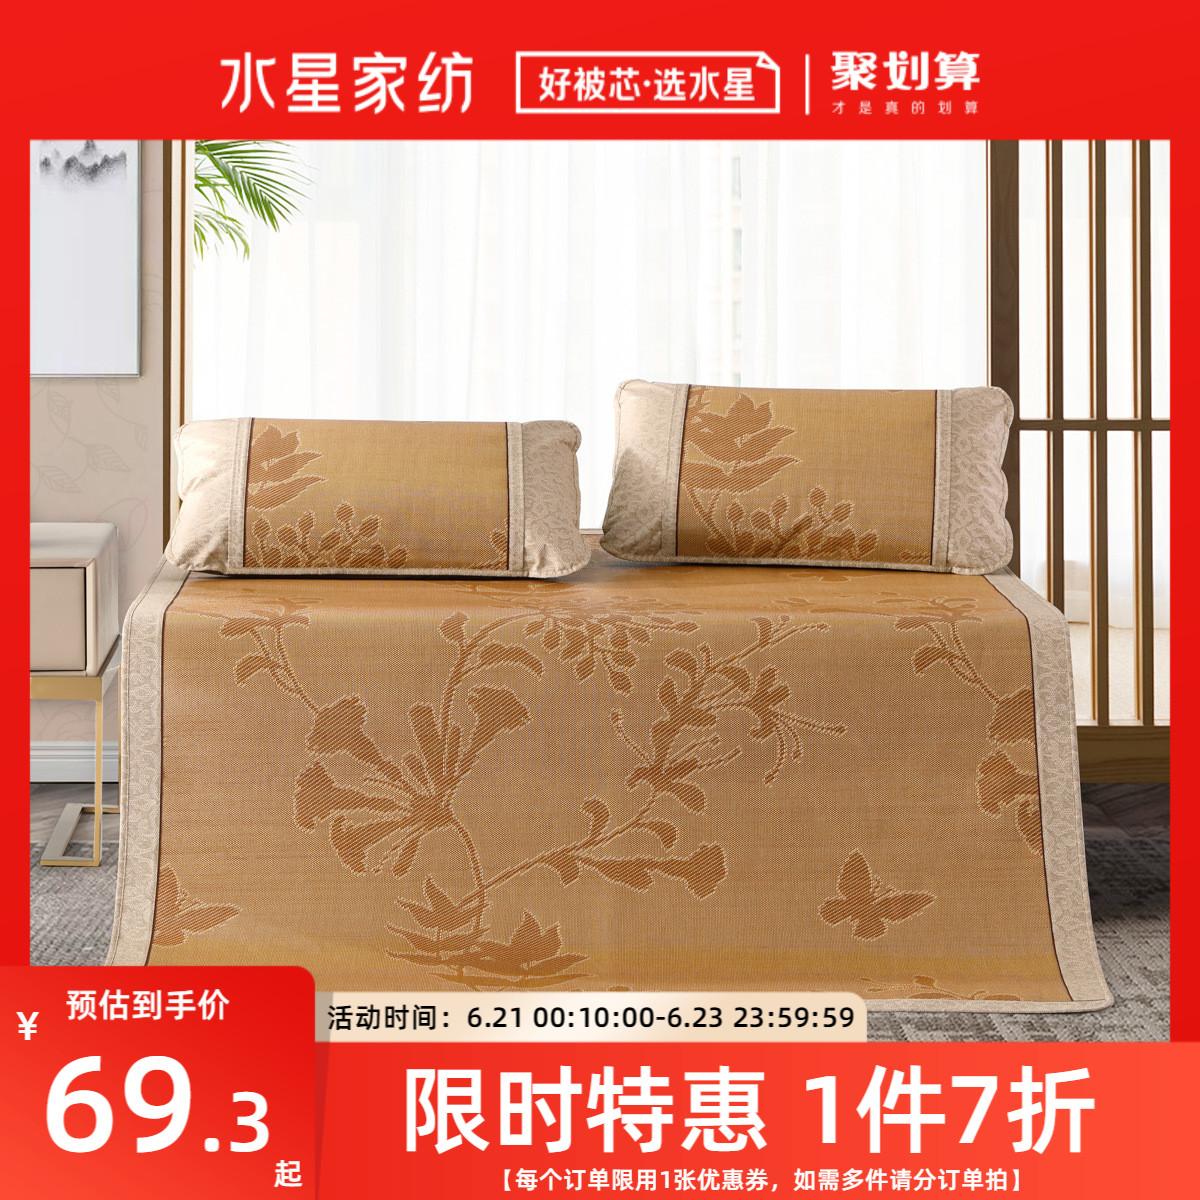 Декоративные одеяла и подушки / Прикроватные коврики Артикул 615184612428